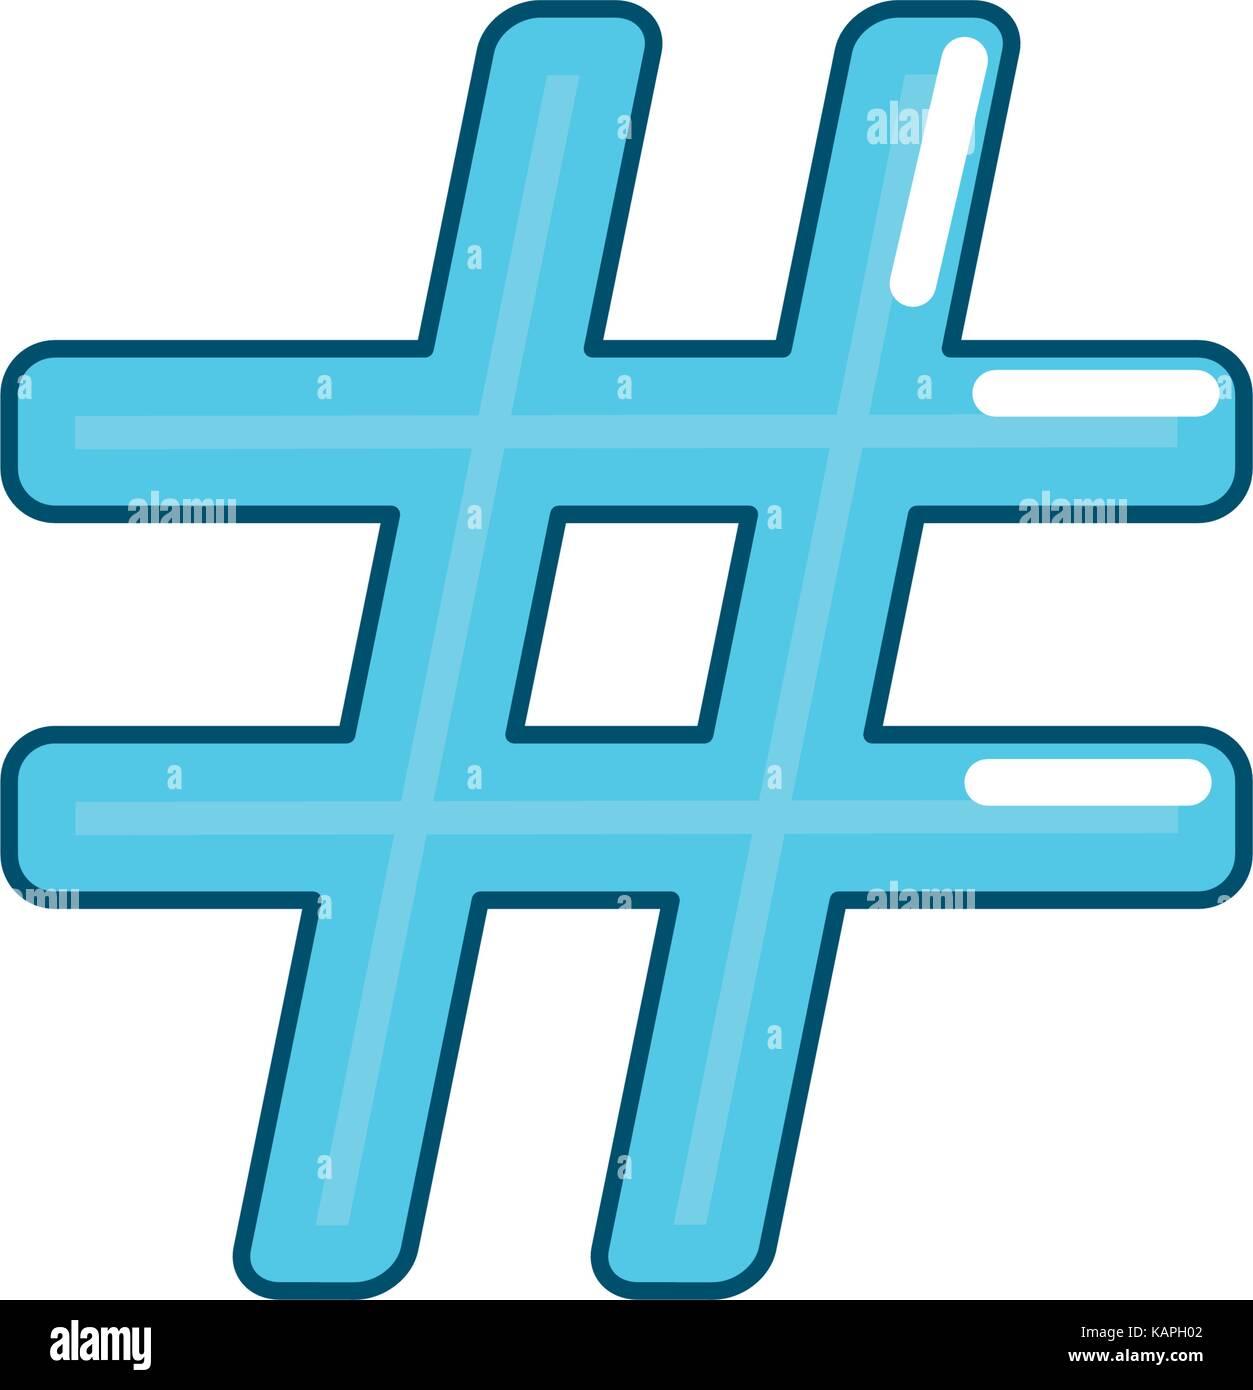 numeral symbol design type icon - Stock Image